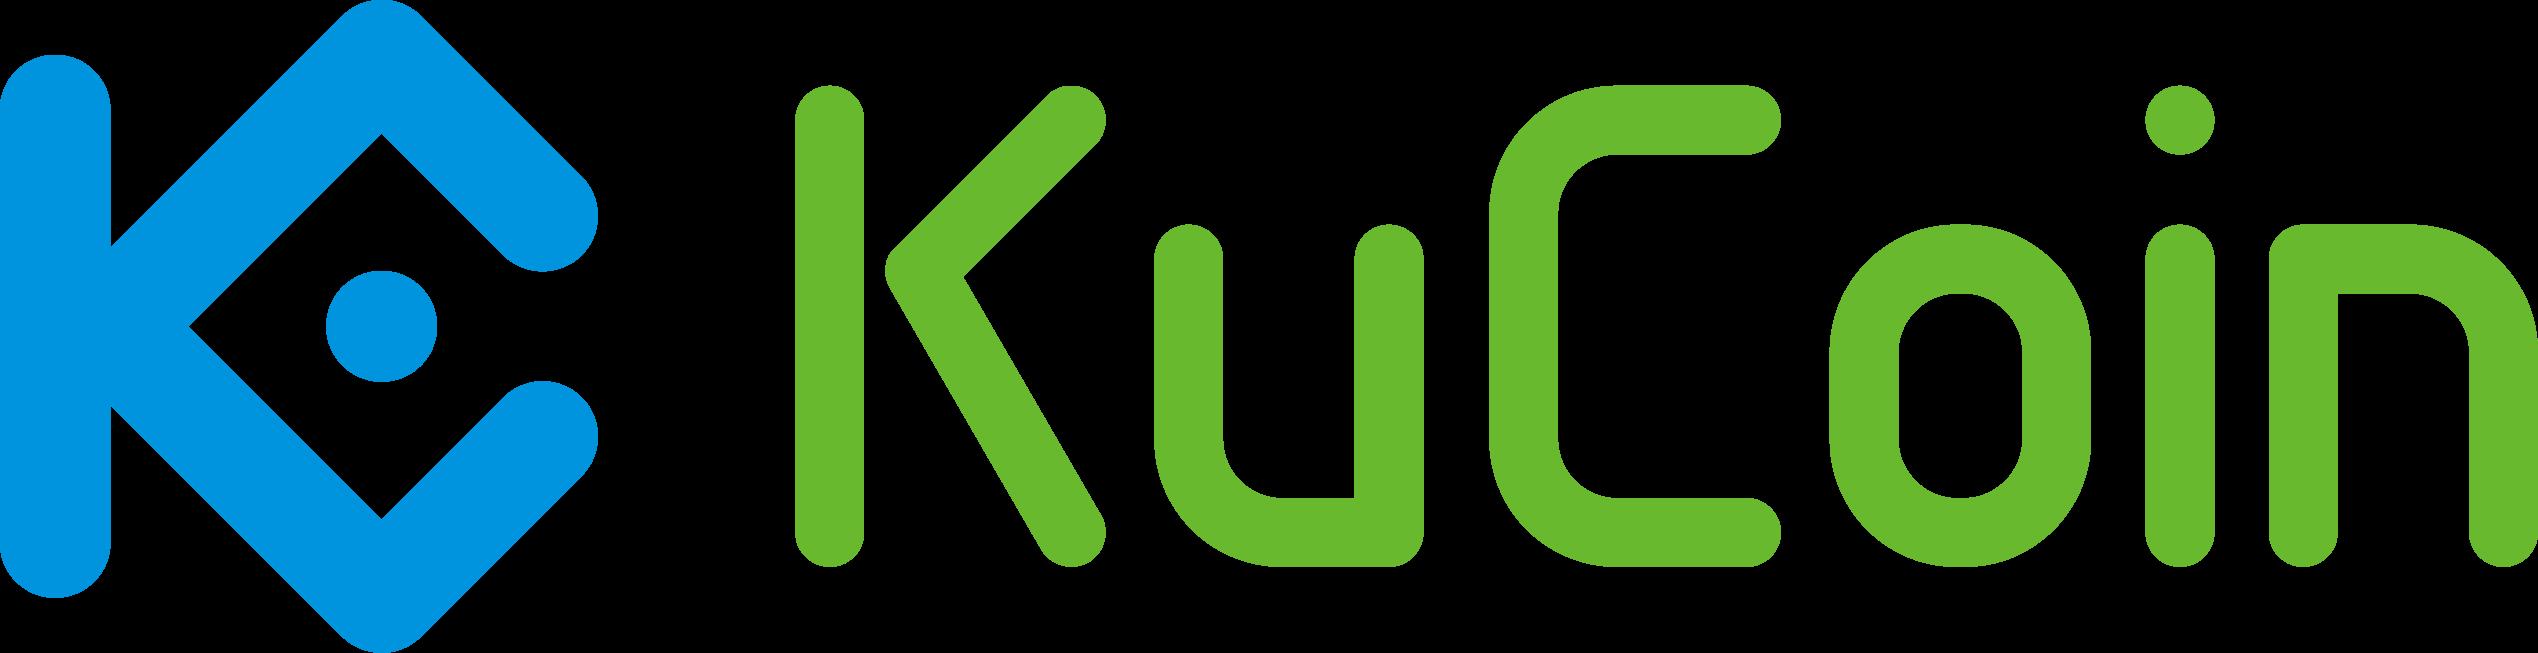 Kucoin Logo png